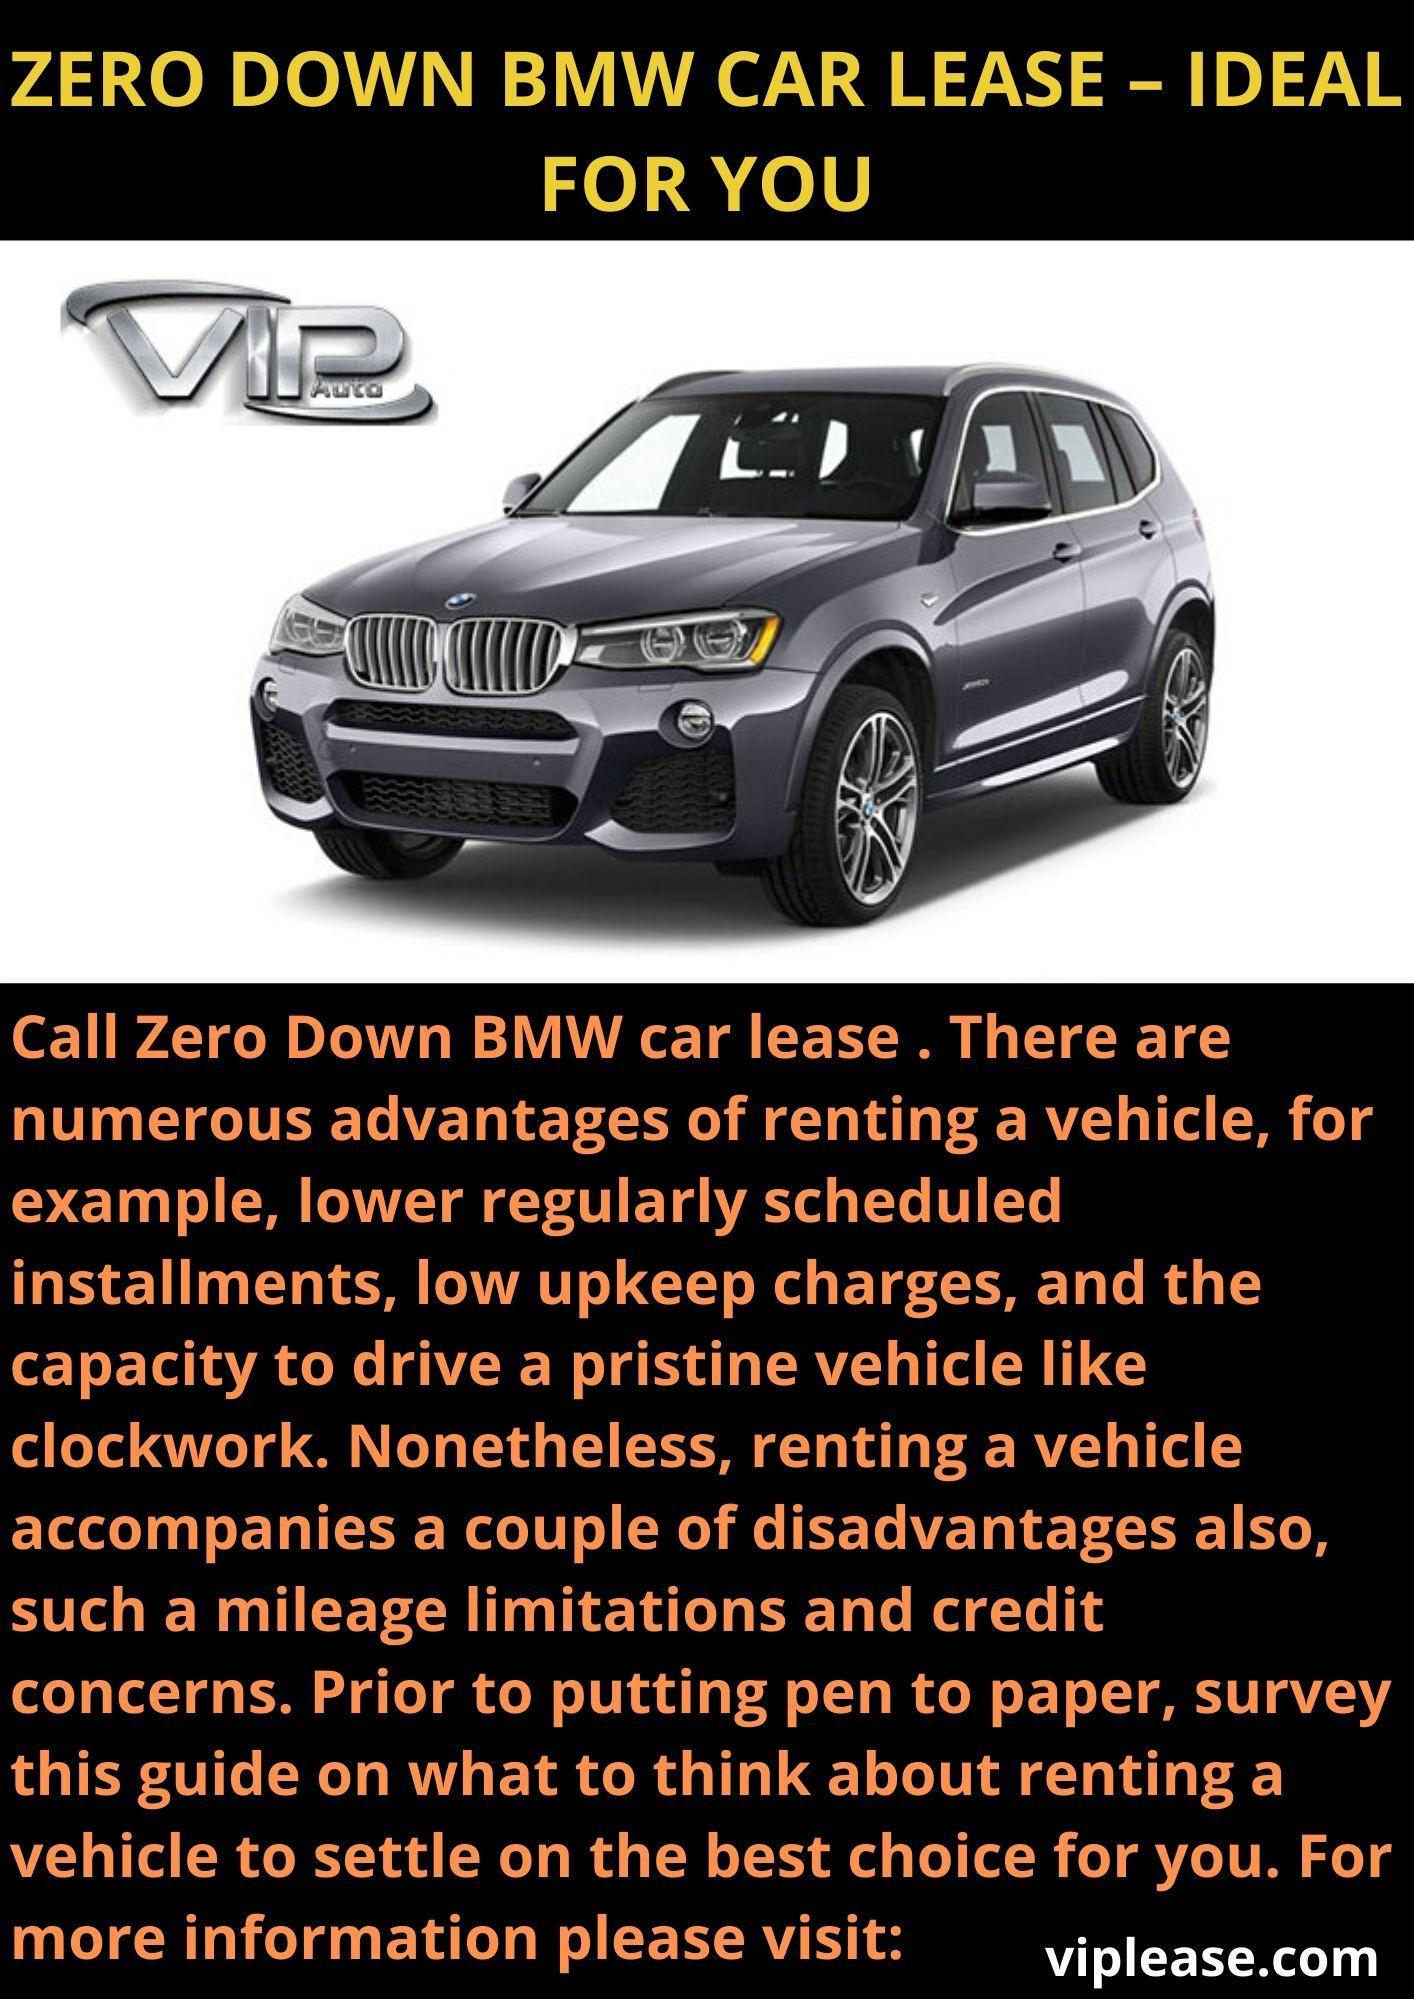 Zero Down Bmw Car Lease Ideal For You Car Lease Bmw Car Lease